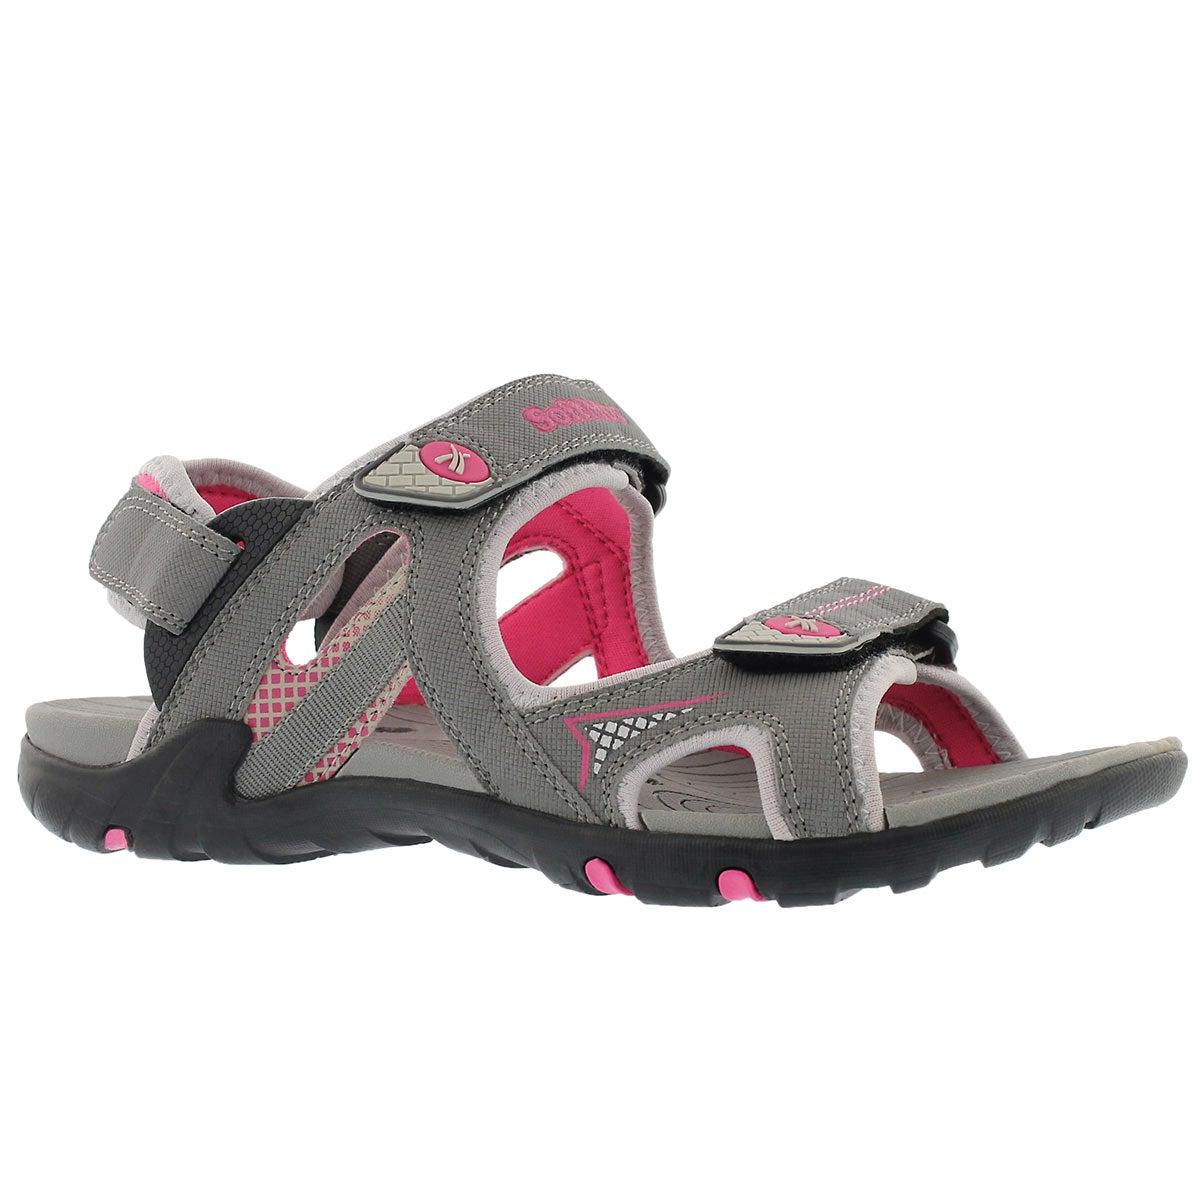 Lds Katelyn grey 3 strap sport sandal